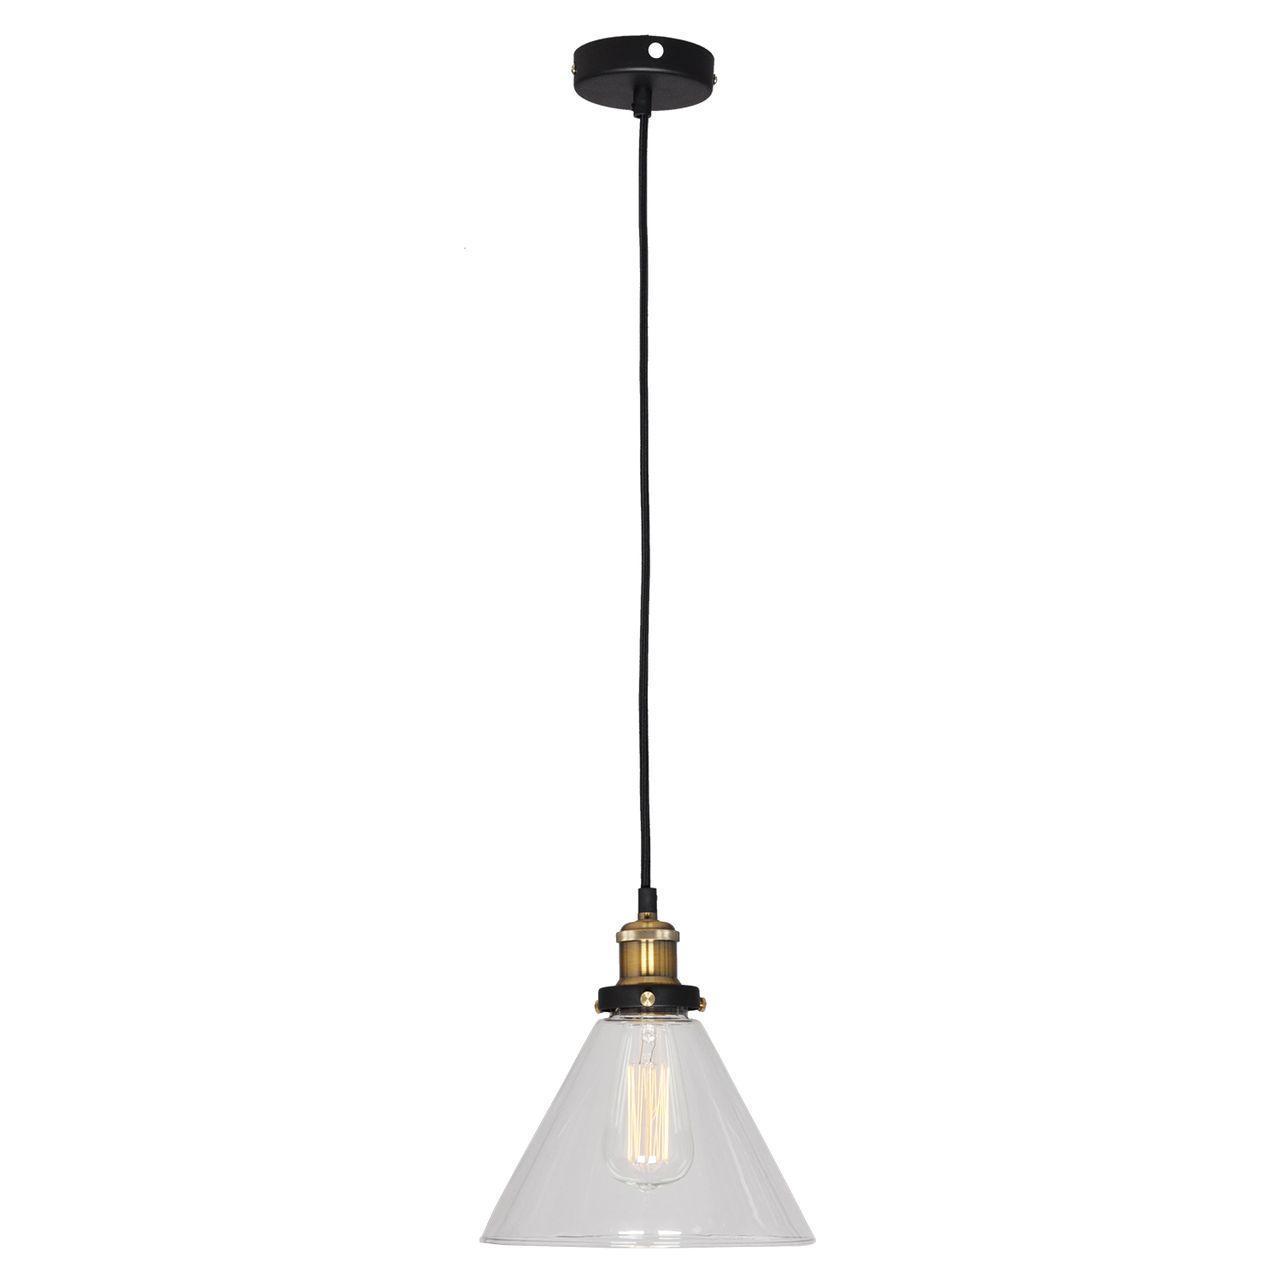 Подвесной светильник Lussole Loft IX LSP-9607 lussole ix